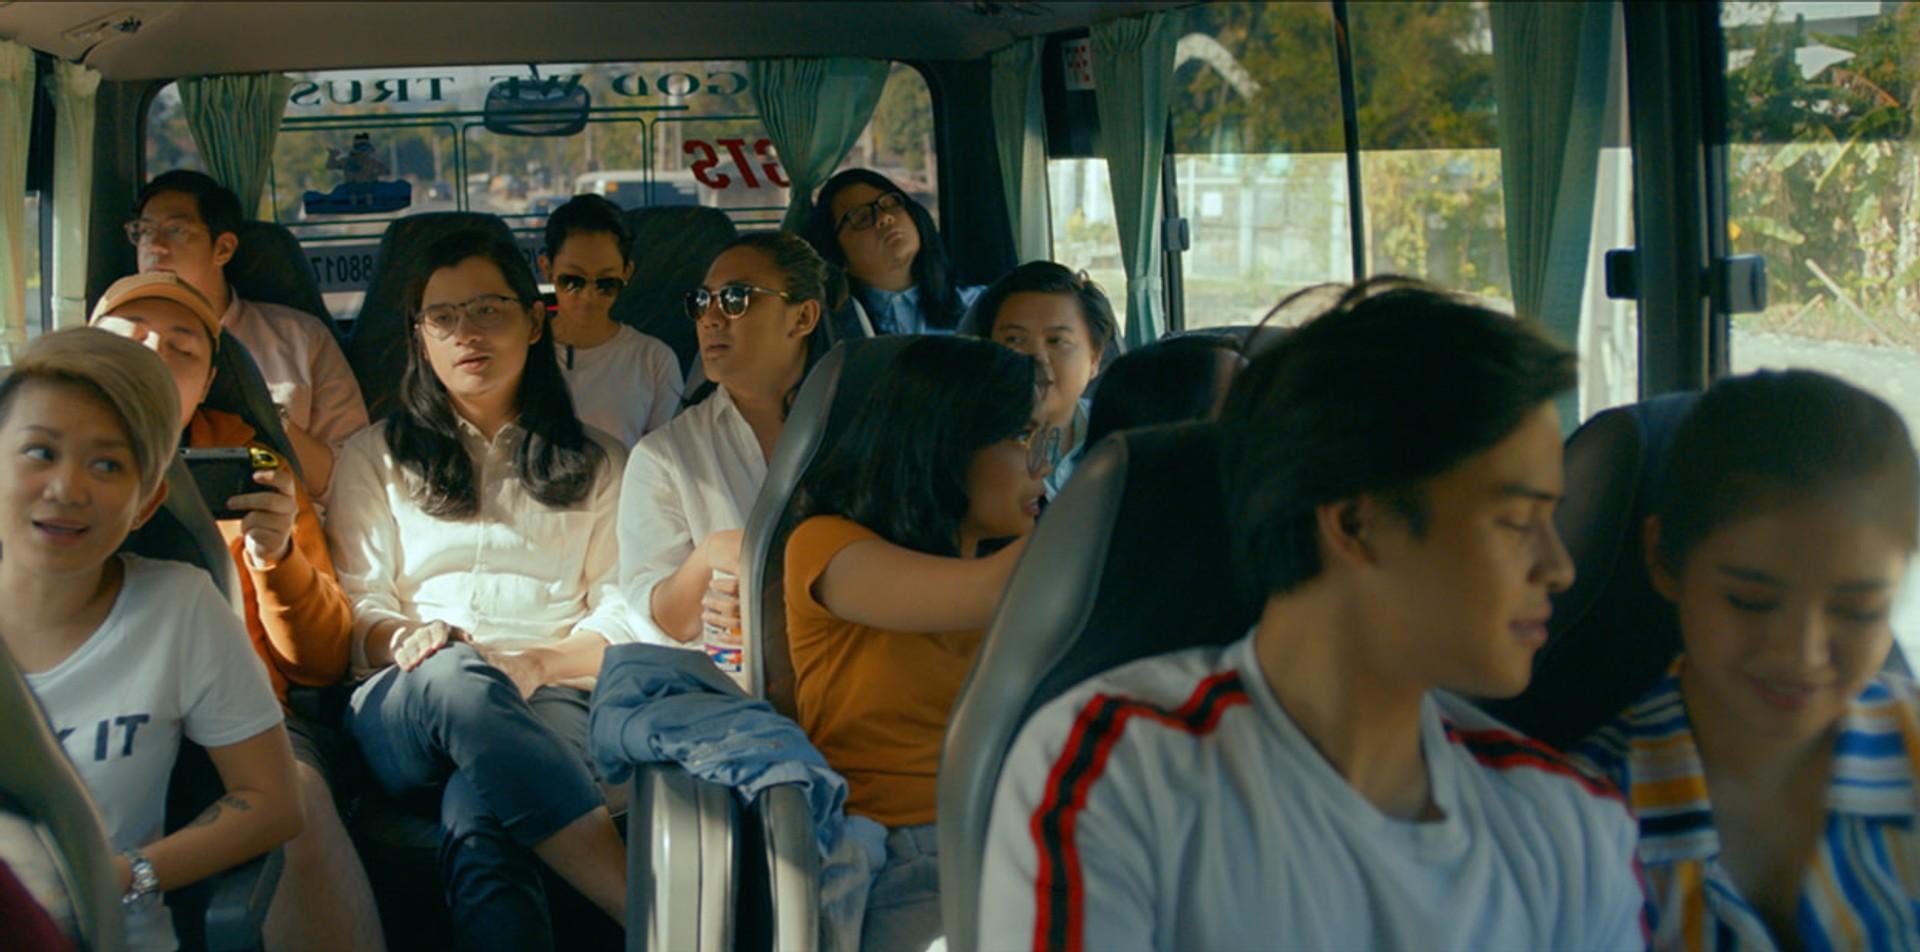 Ben&Ben's 'Araw-Araw' wins Best Theme Song for LSS at Pista ng Pelikulang Pilipino